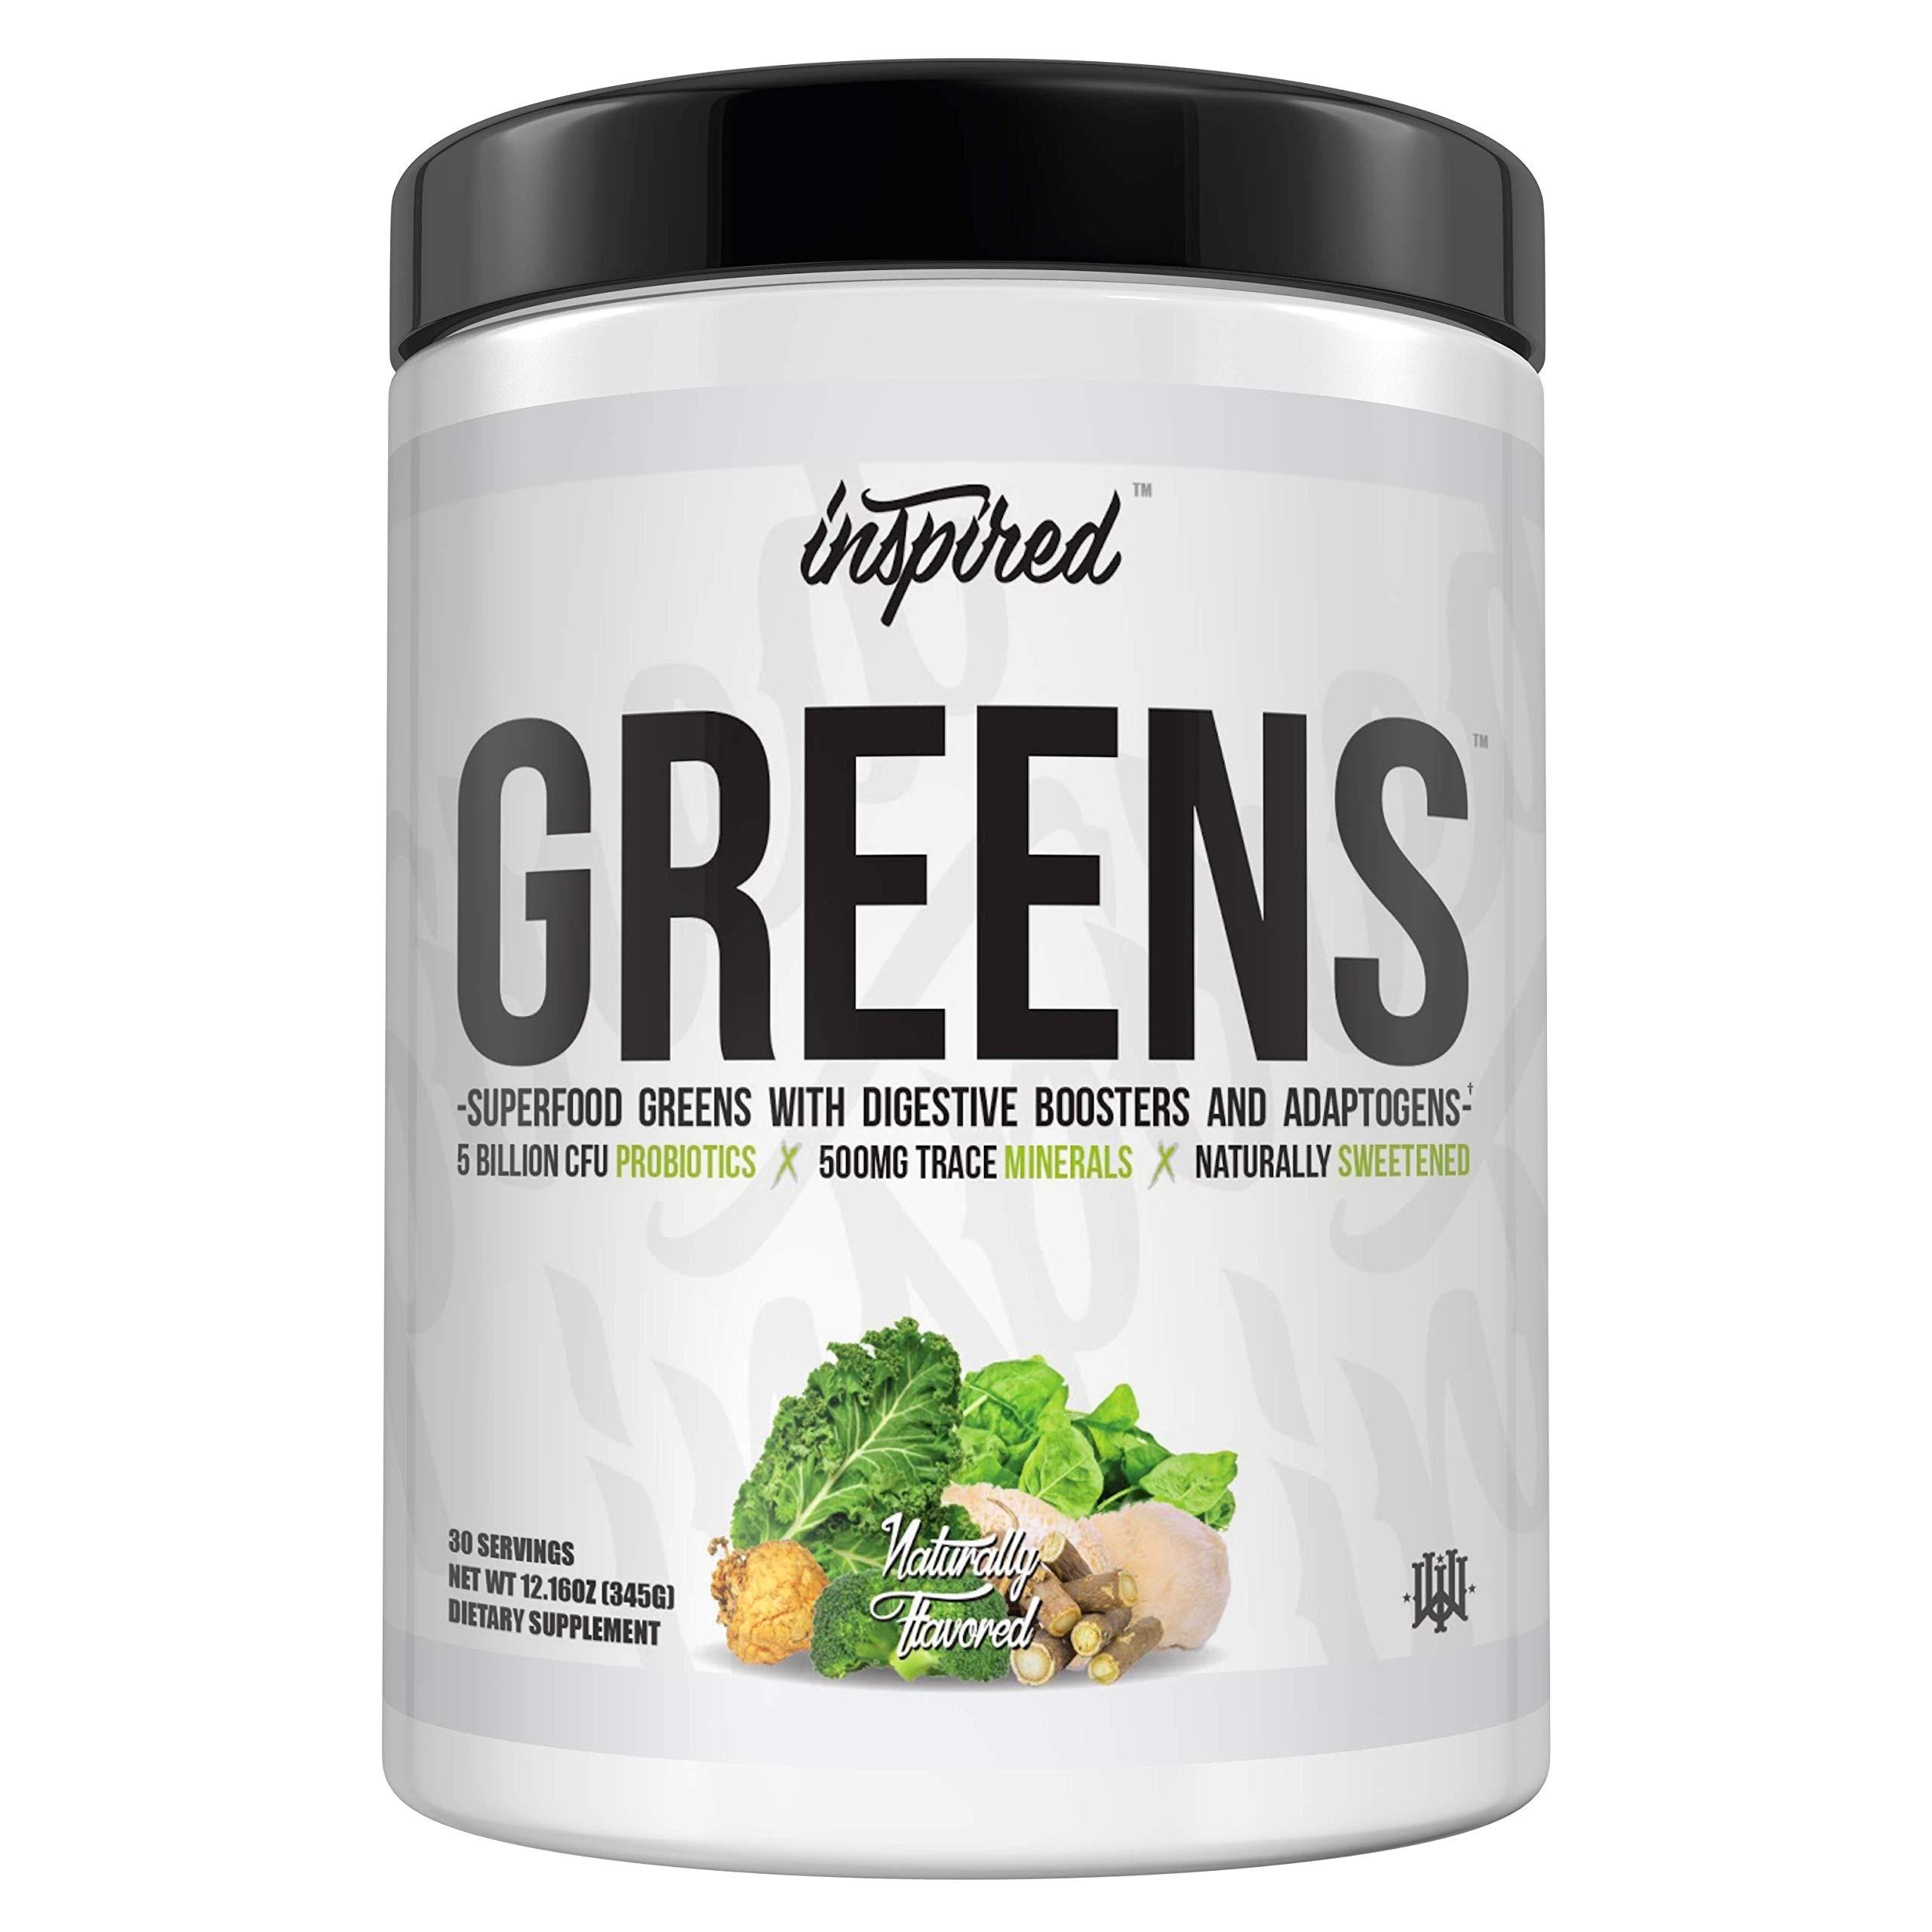 Inspired Nutraceuticals Greens+ | Superfood Greens with Digestion Booster, Adaptogen, Probiotics, Spirulina, Chlorella, Ashwagandha, Maca, Stinging Nettle, Lion's Mane, Dandelion, Kale | Unflavored by Inspired Nutraceuticals